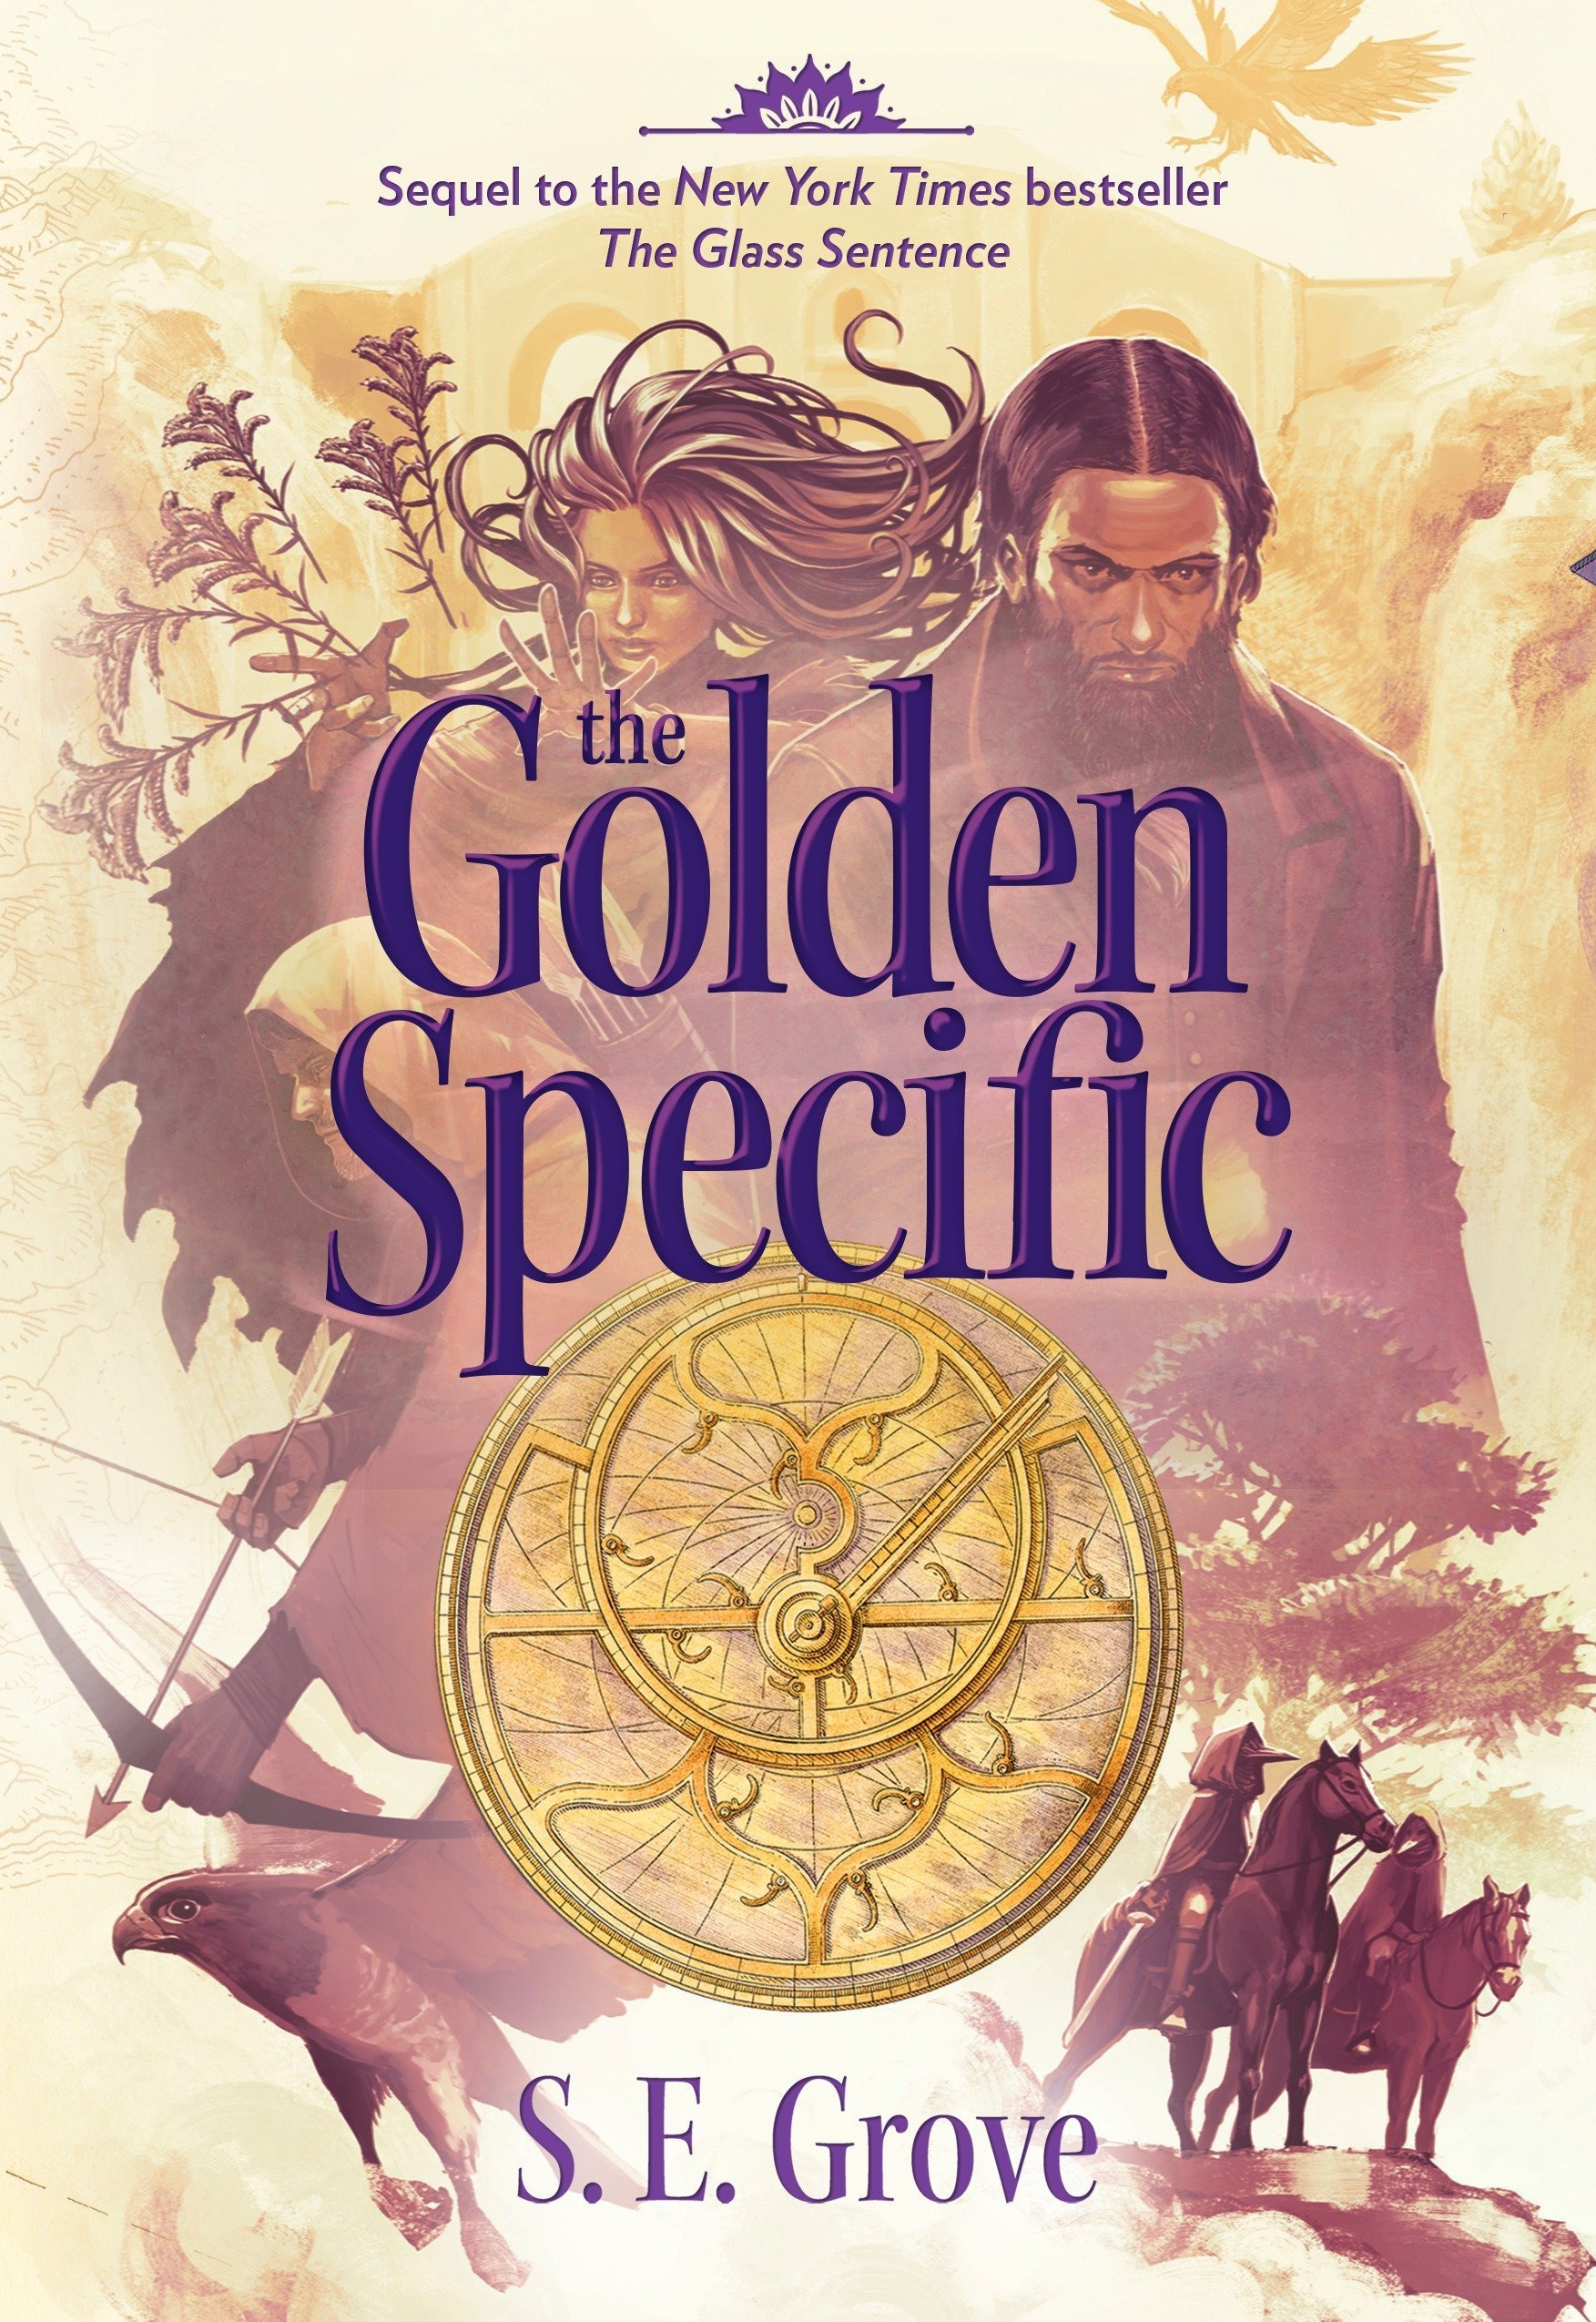 The Golden Specific (Mapmakers): Amazon.es: S. E. Grove: Libros en idiomas extranjeros